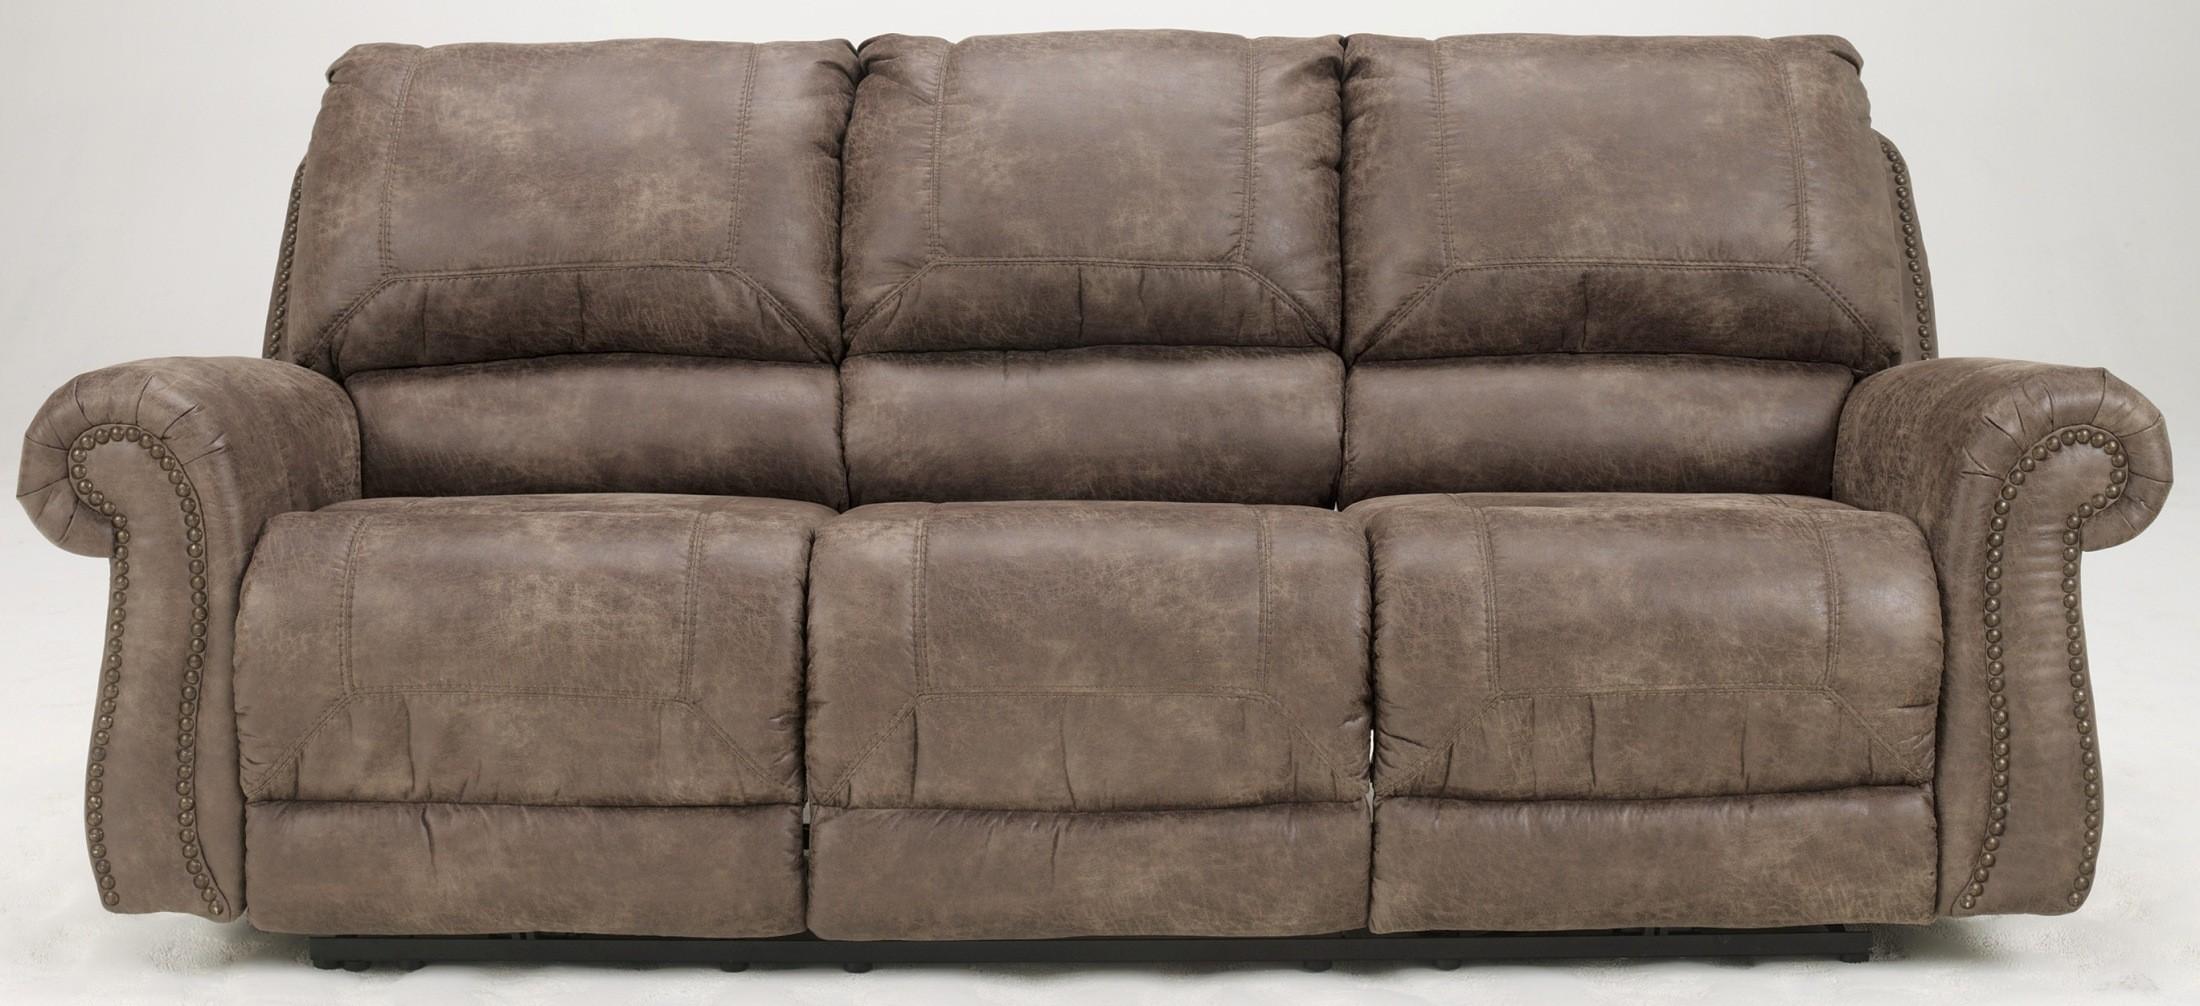 Oberson Gunsmoke Reclining Sofa From Ashley 7410088